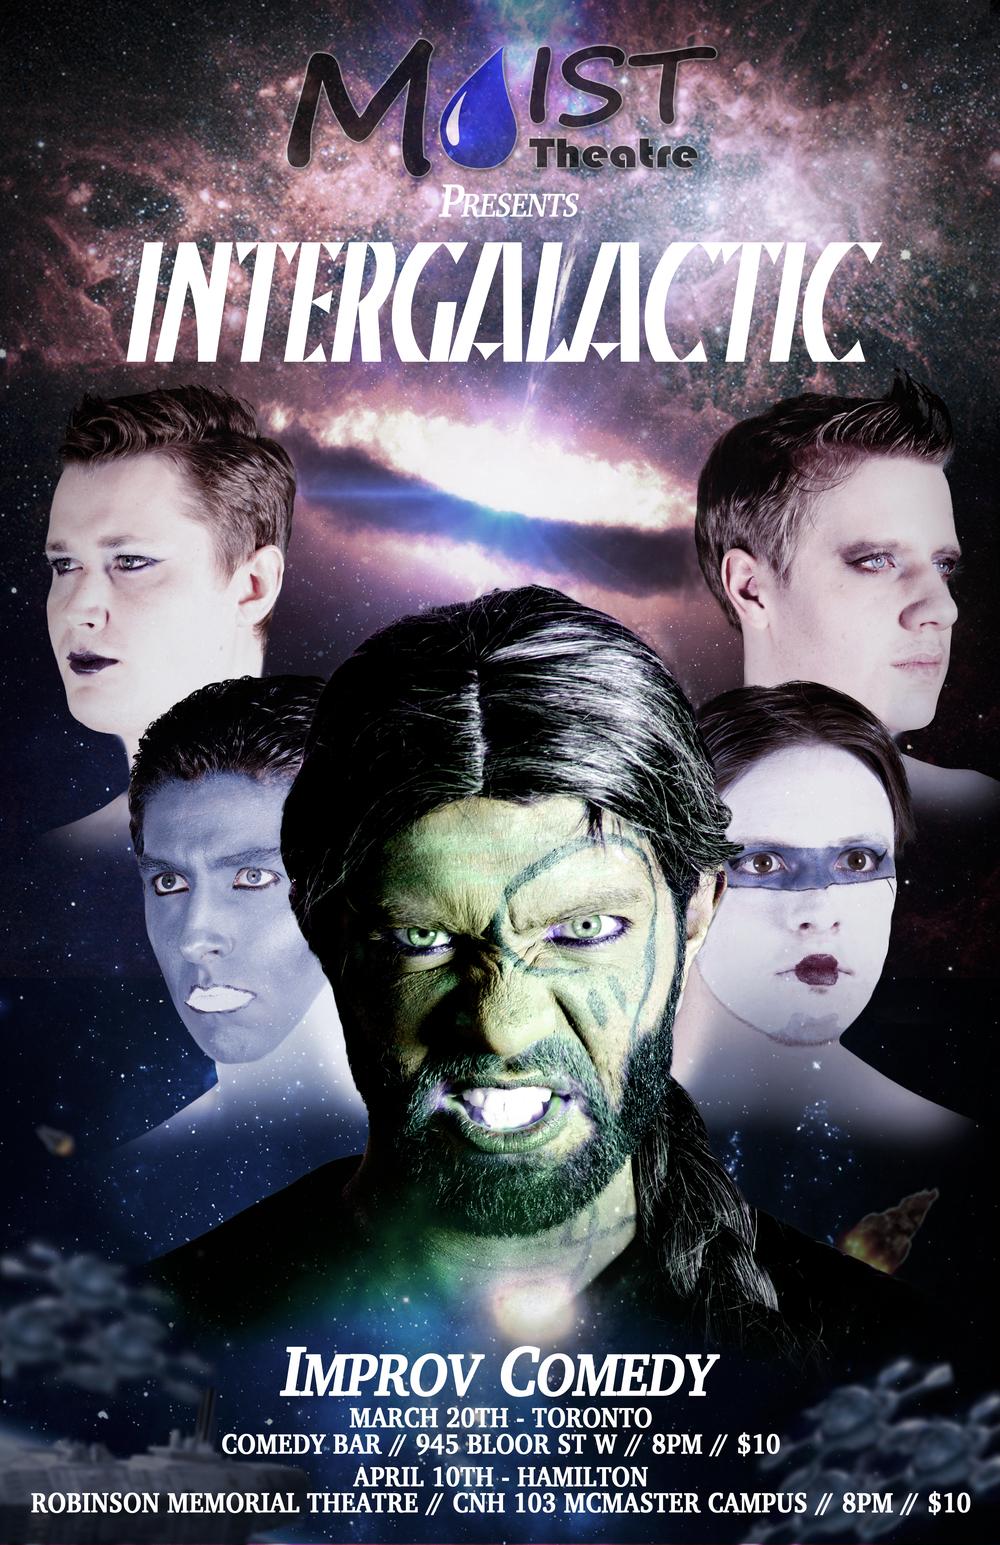 Intergalactic Poster V05.jpg